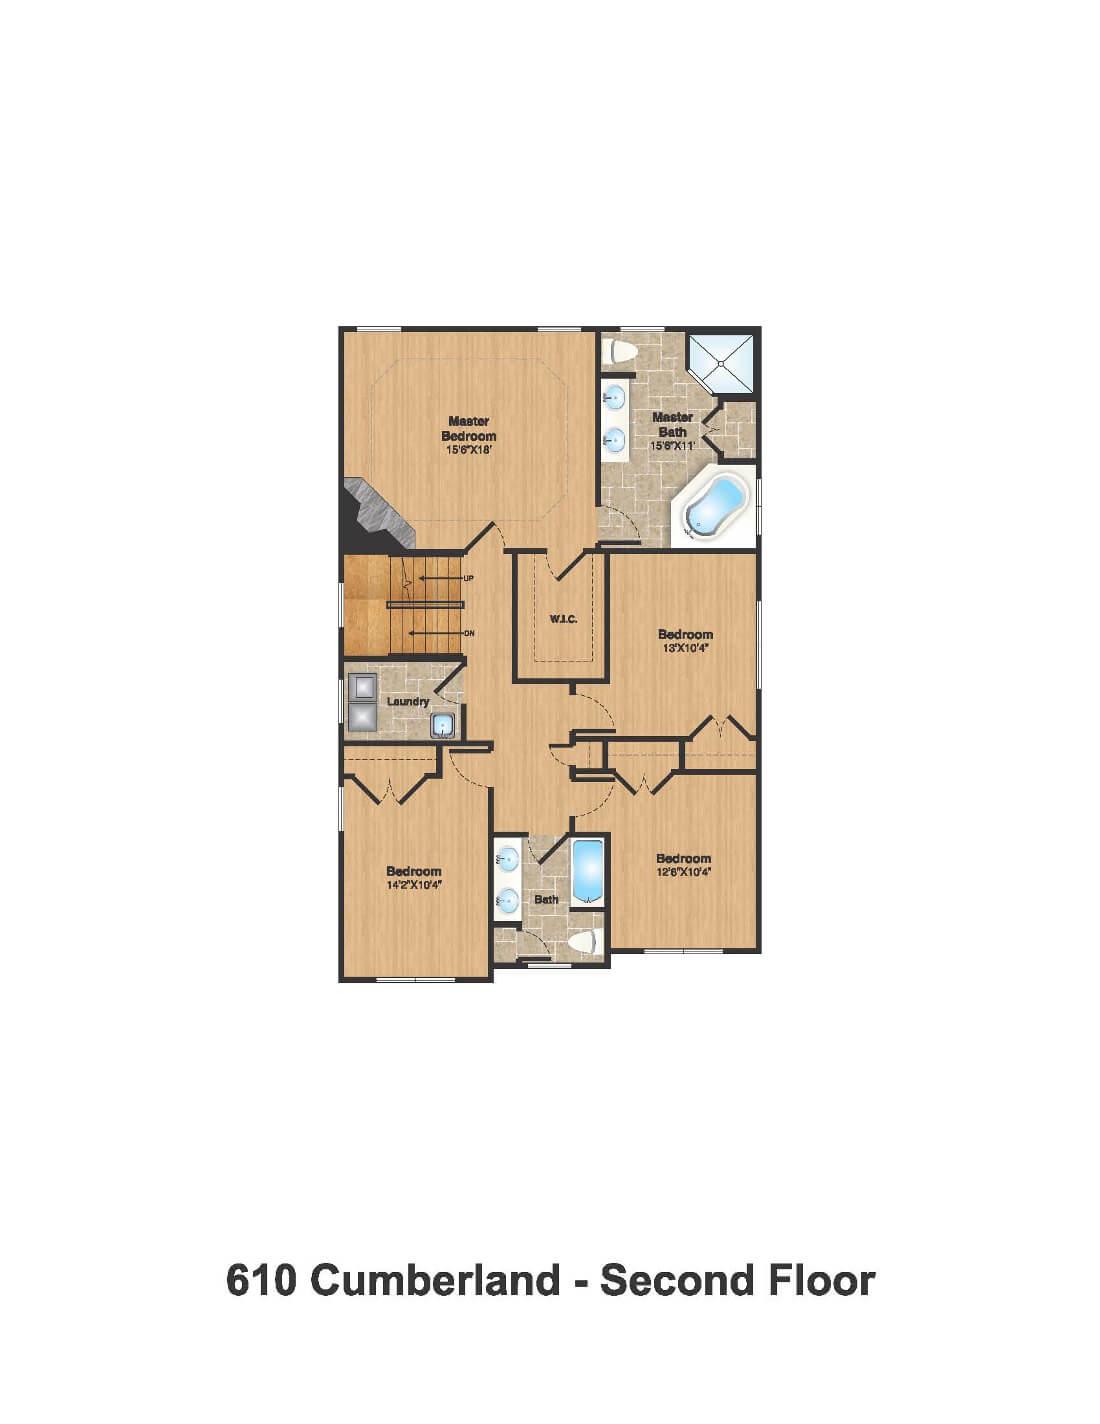 610 Cumberland Floorplan 2nd Floor Color